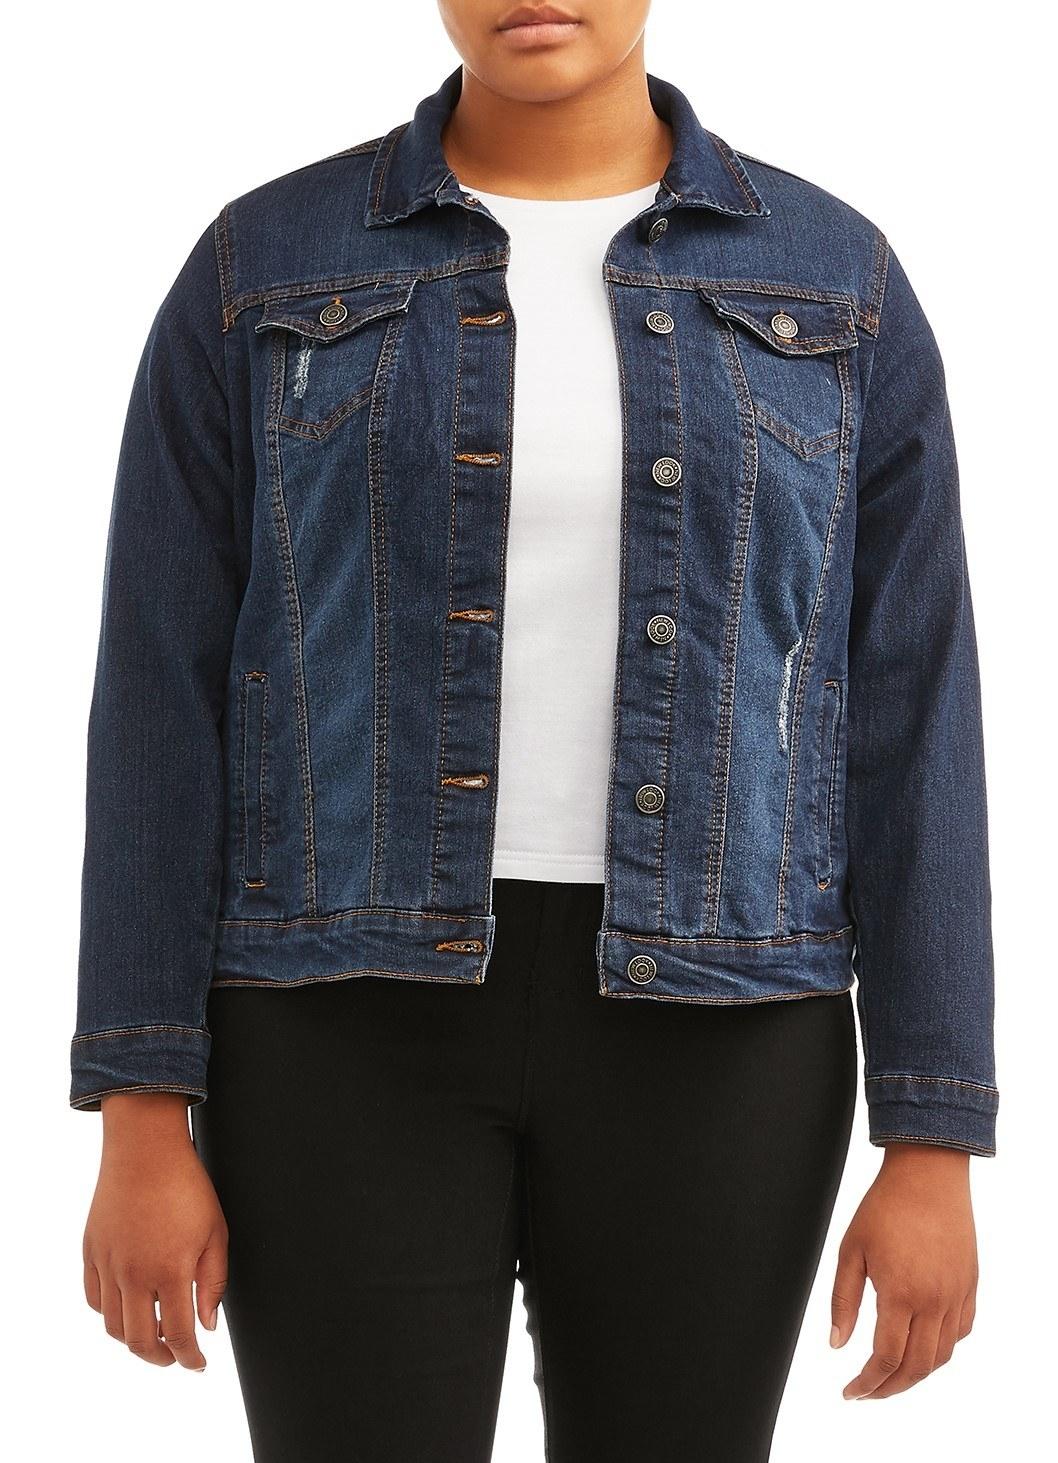 Model wears distressed denim jacket in dark wash